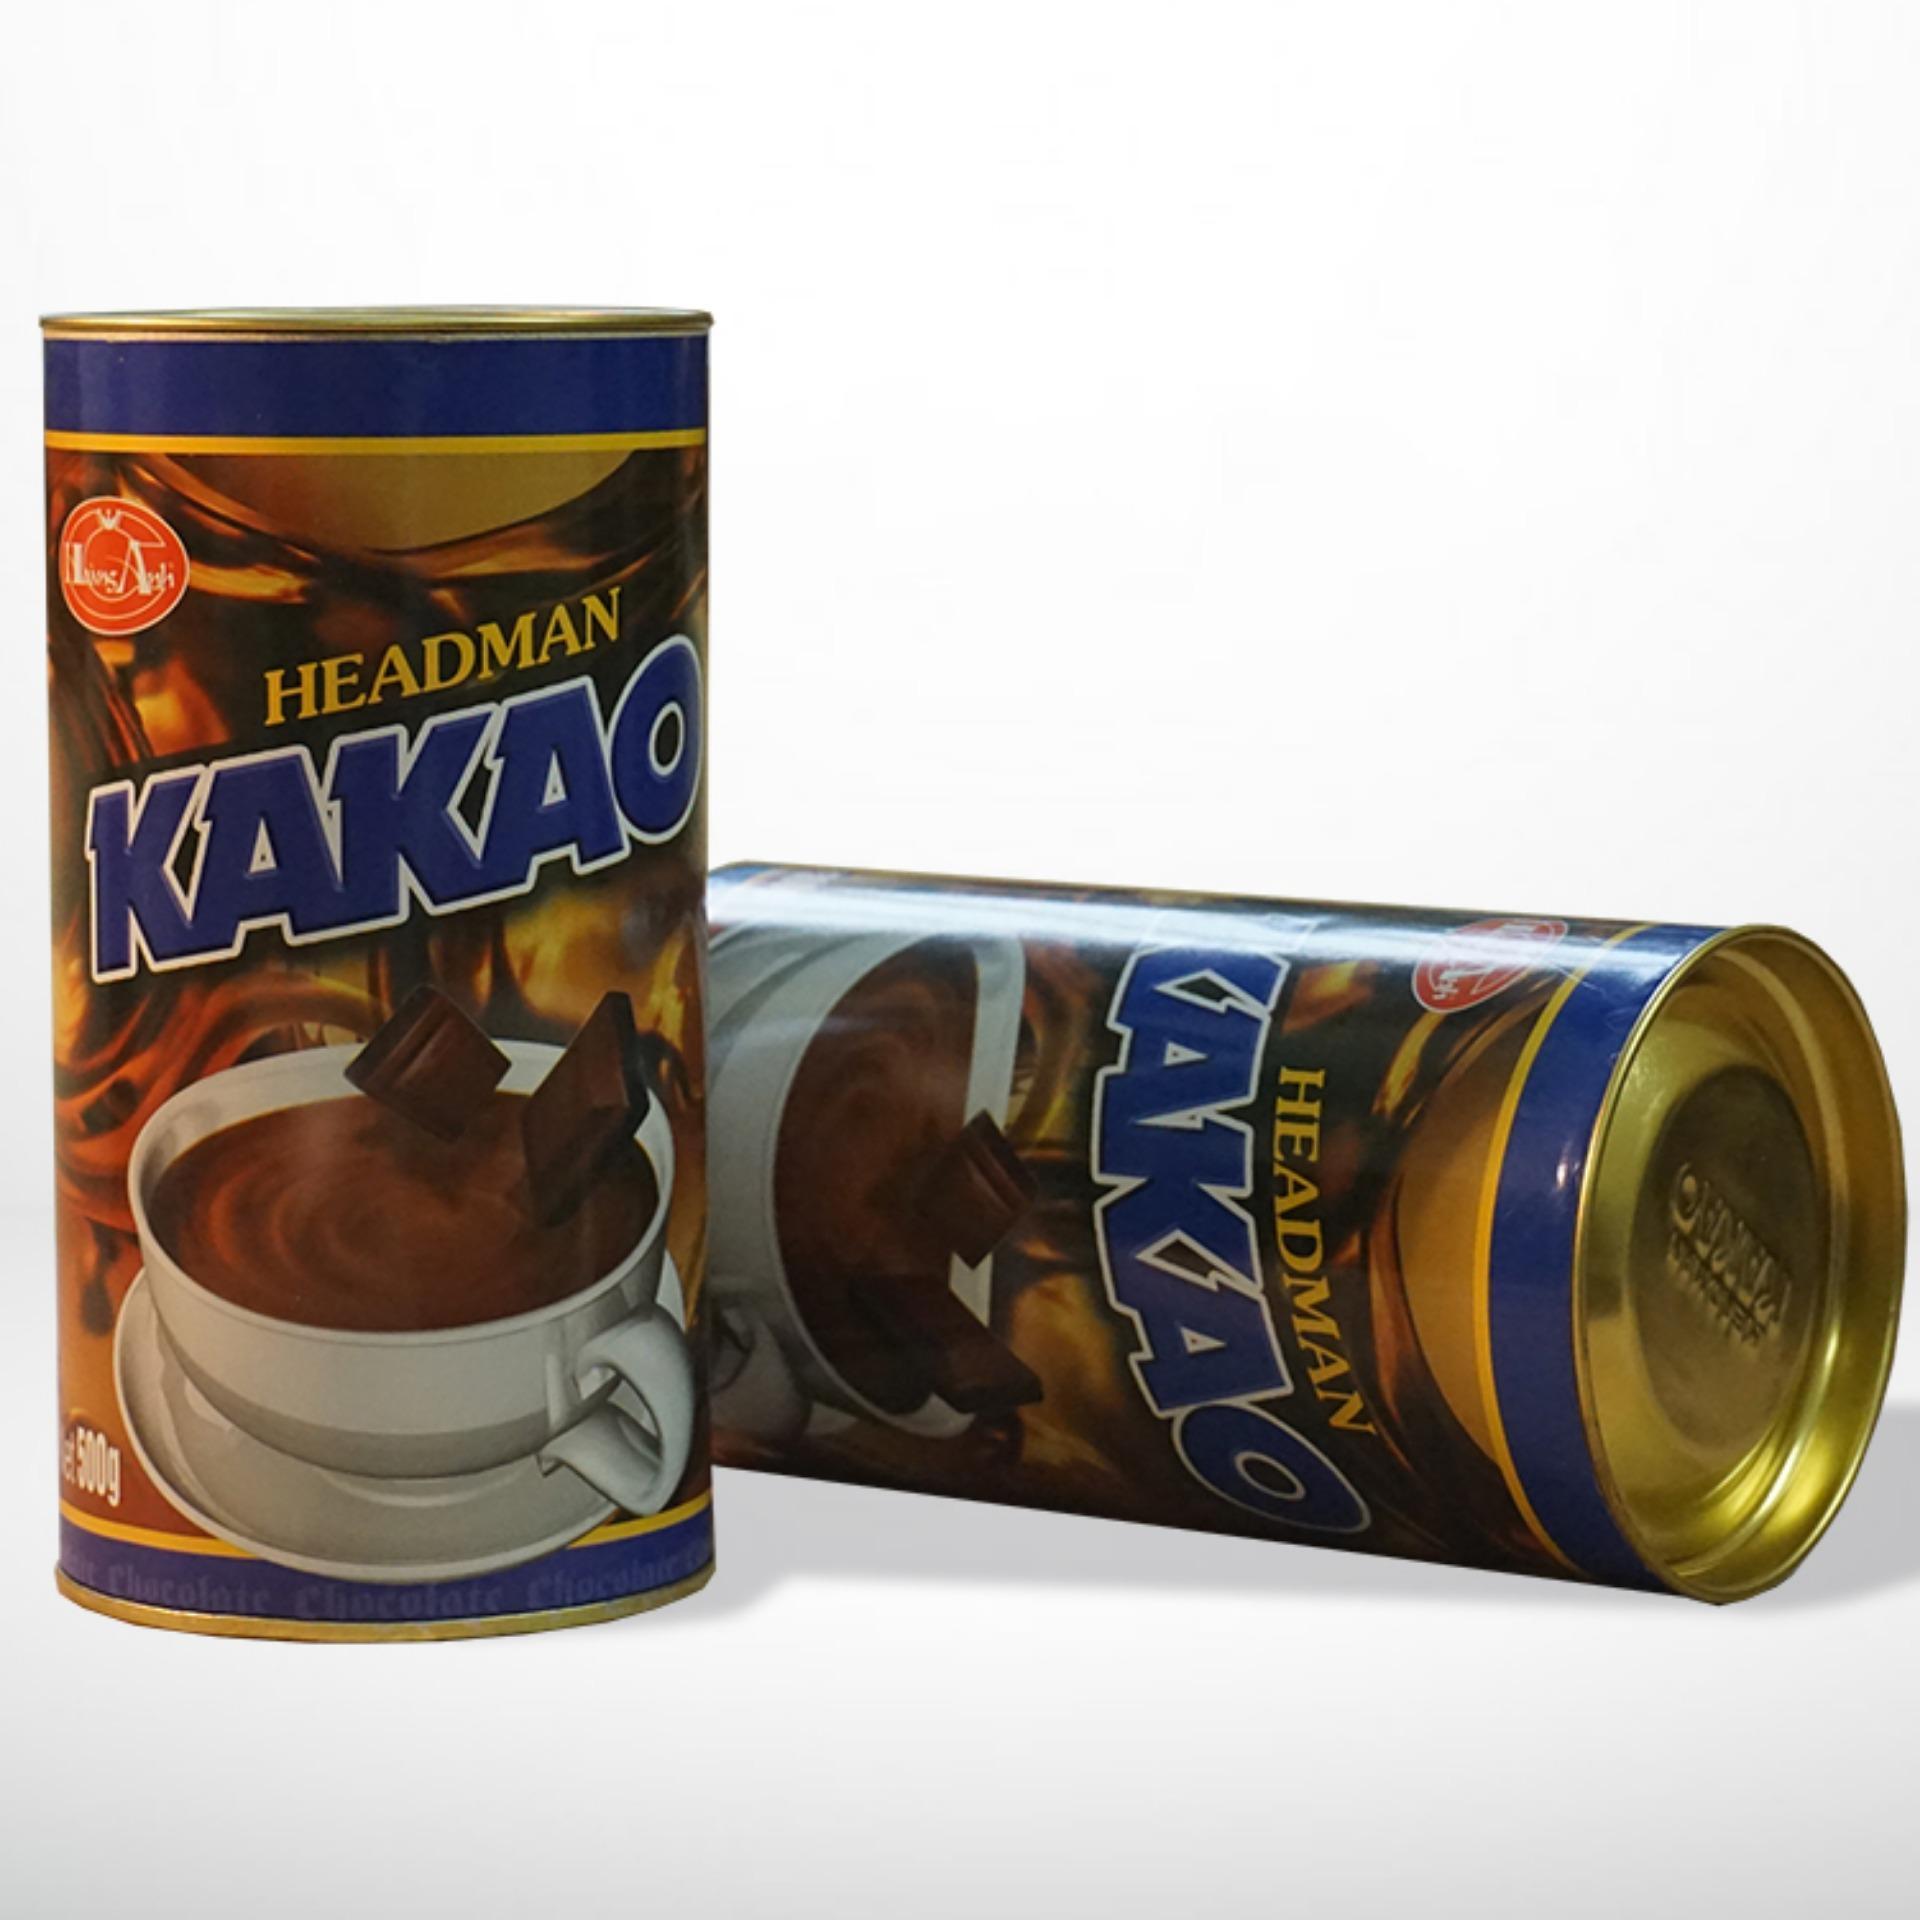 Bột cacao Headman ( 2 in 1 )Hộp Tròn 500 gr ( Bộ 2 hộp)